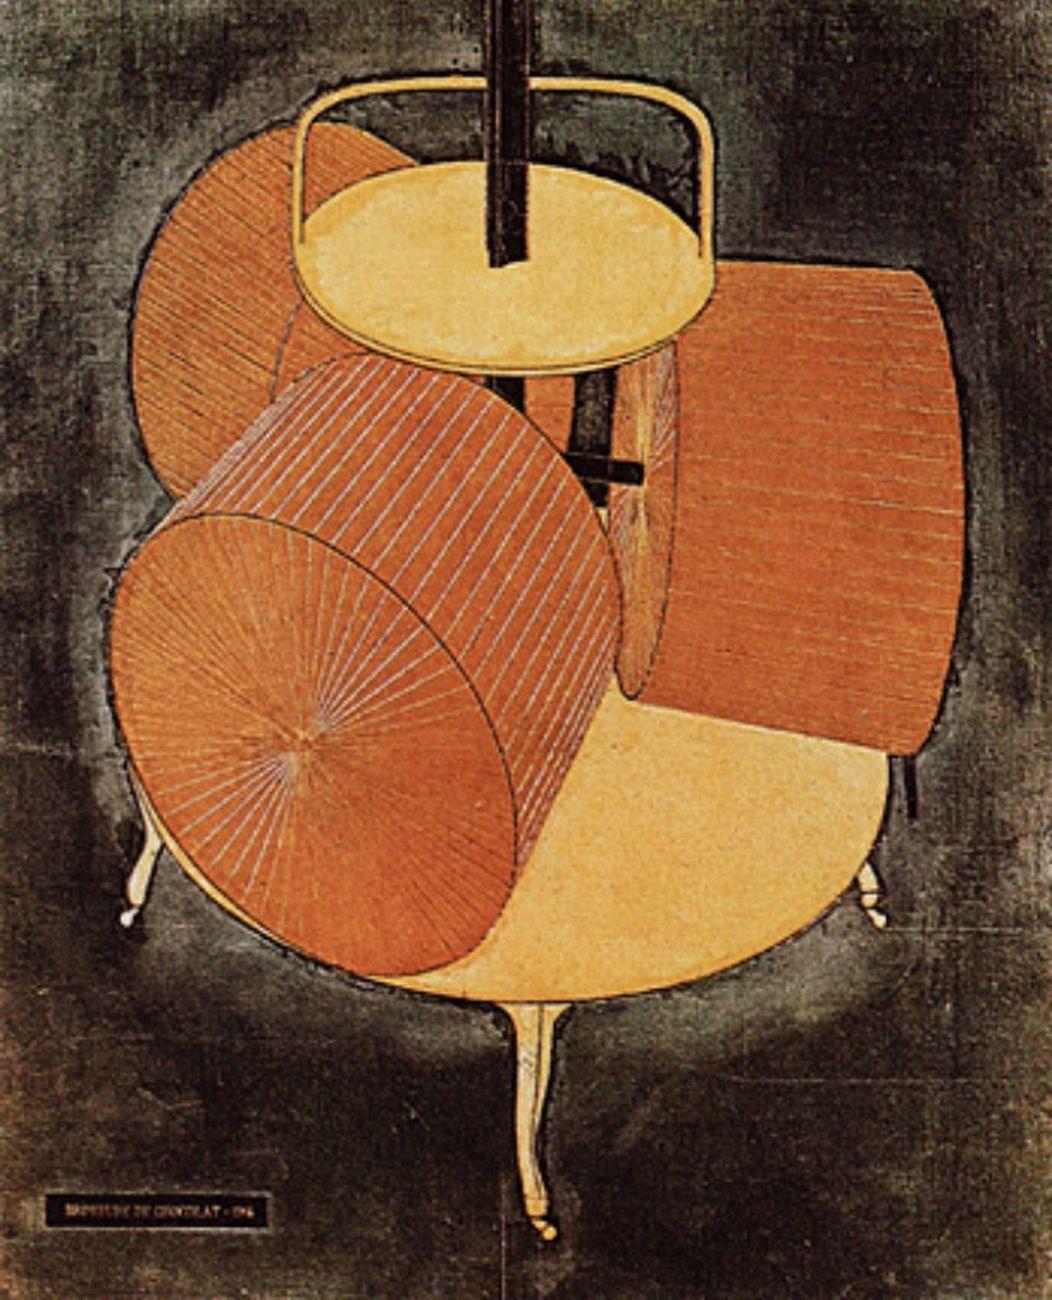 Marcel Duchamp, Broyeuse de Chocolat, 1913. Philadelphia, The Philadelphia Museum of Art